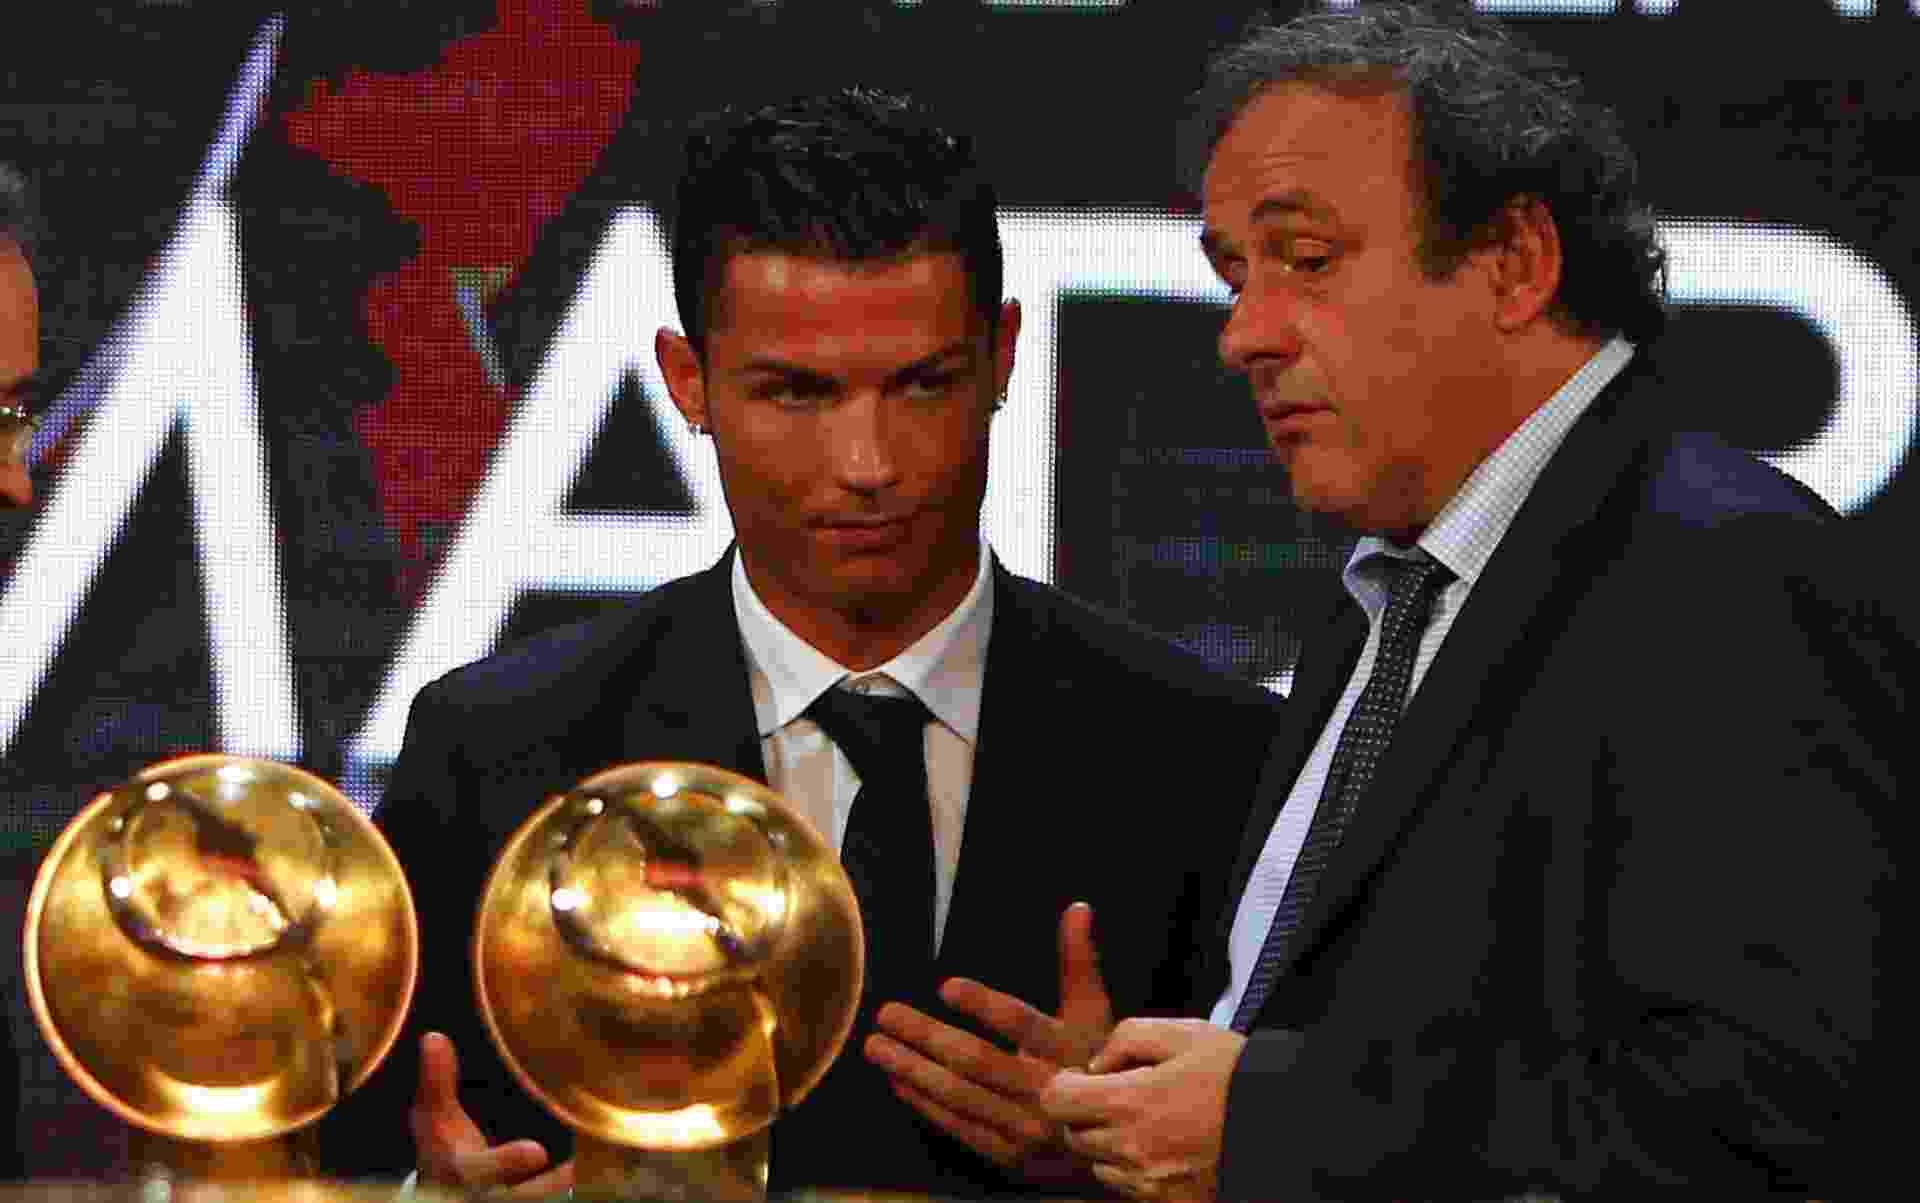 29. dez. 2014 - Cristiano Ronaldo recebe prêmio em Dubai - AFP PHOTO / MARWAN NAAMANI